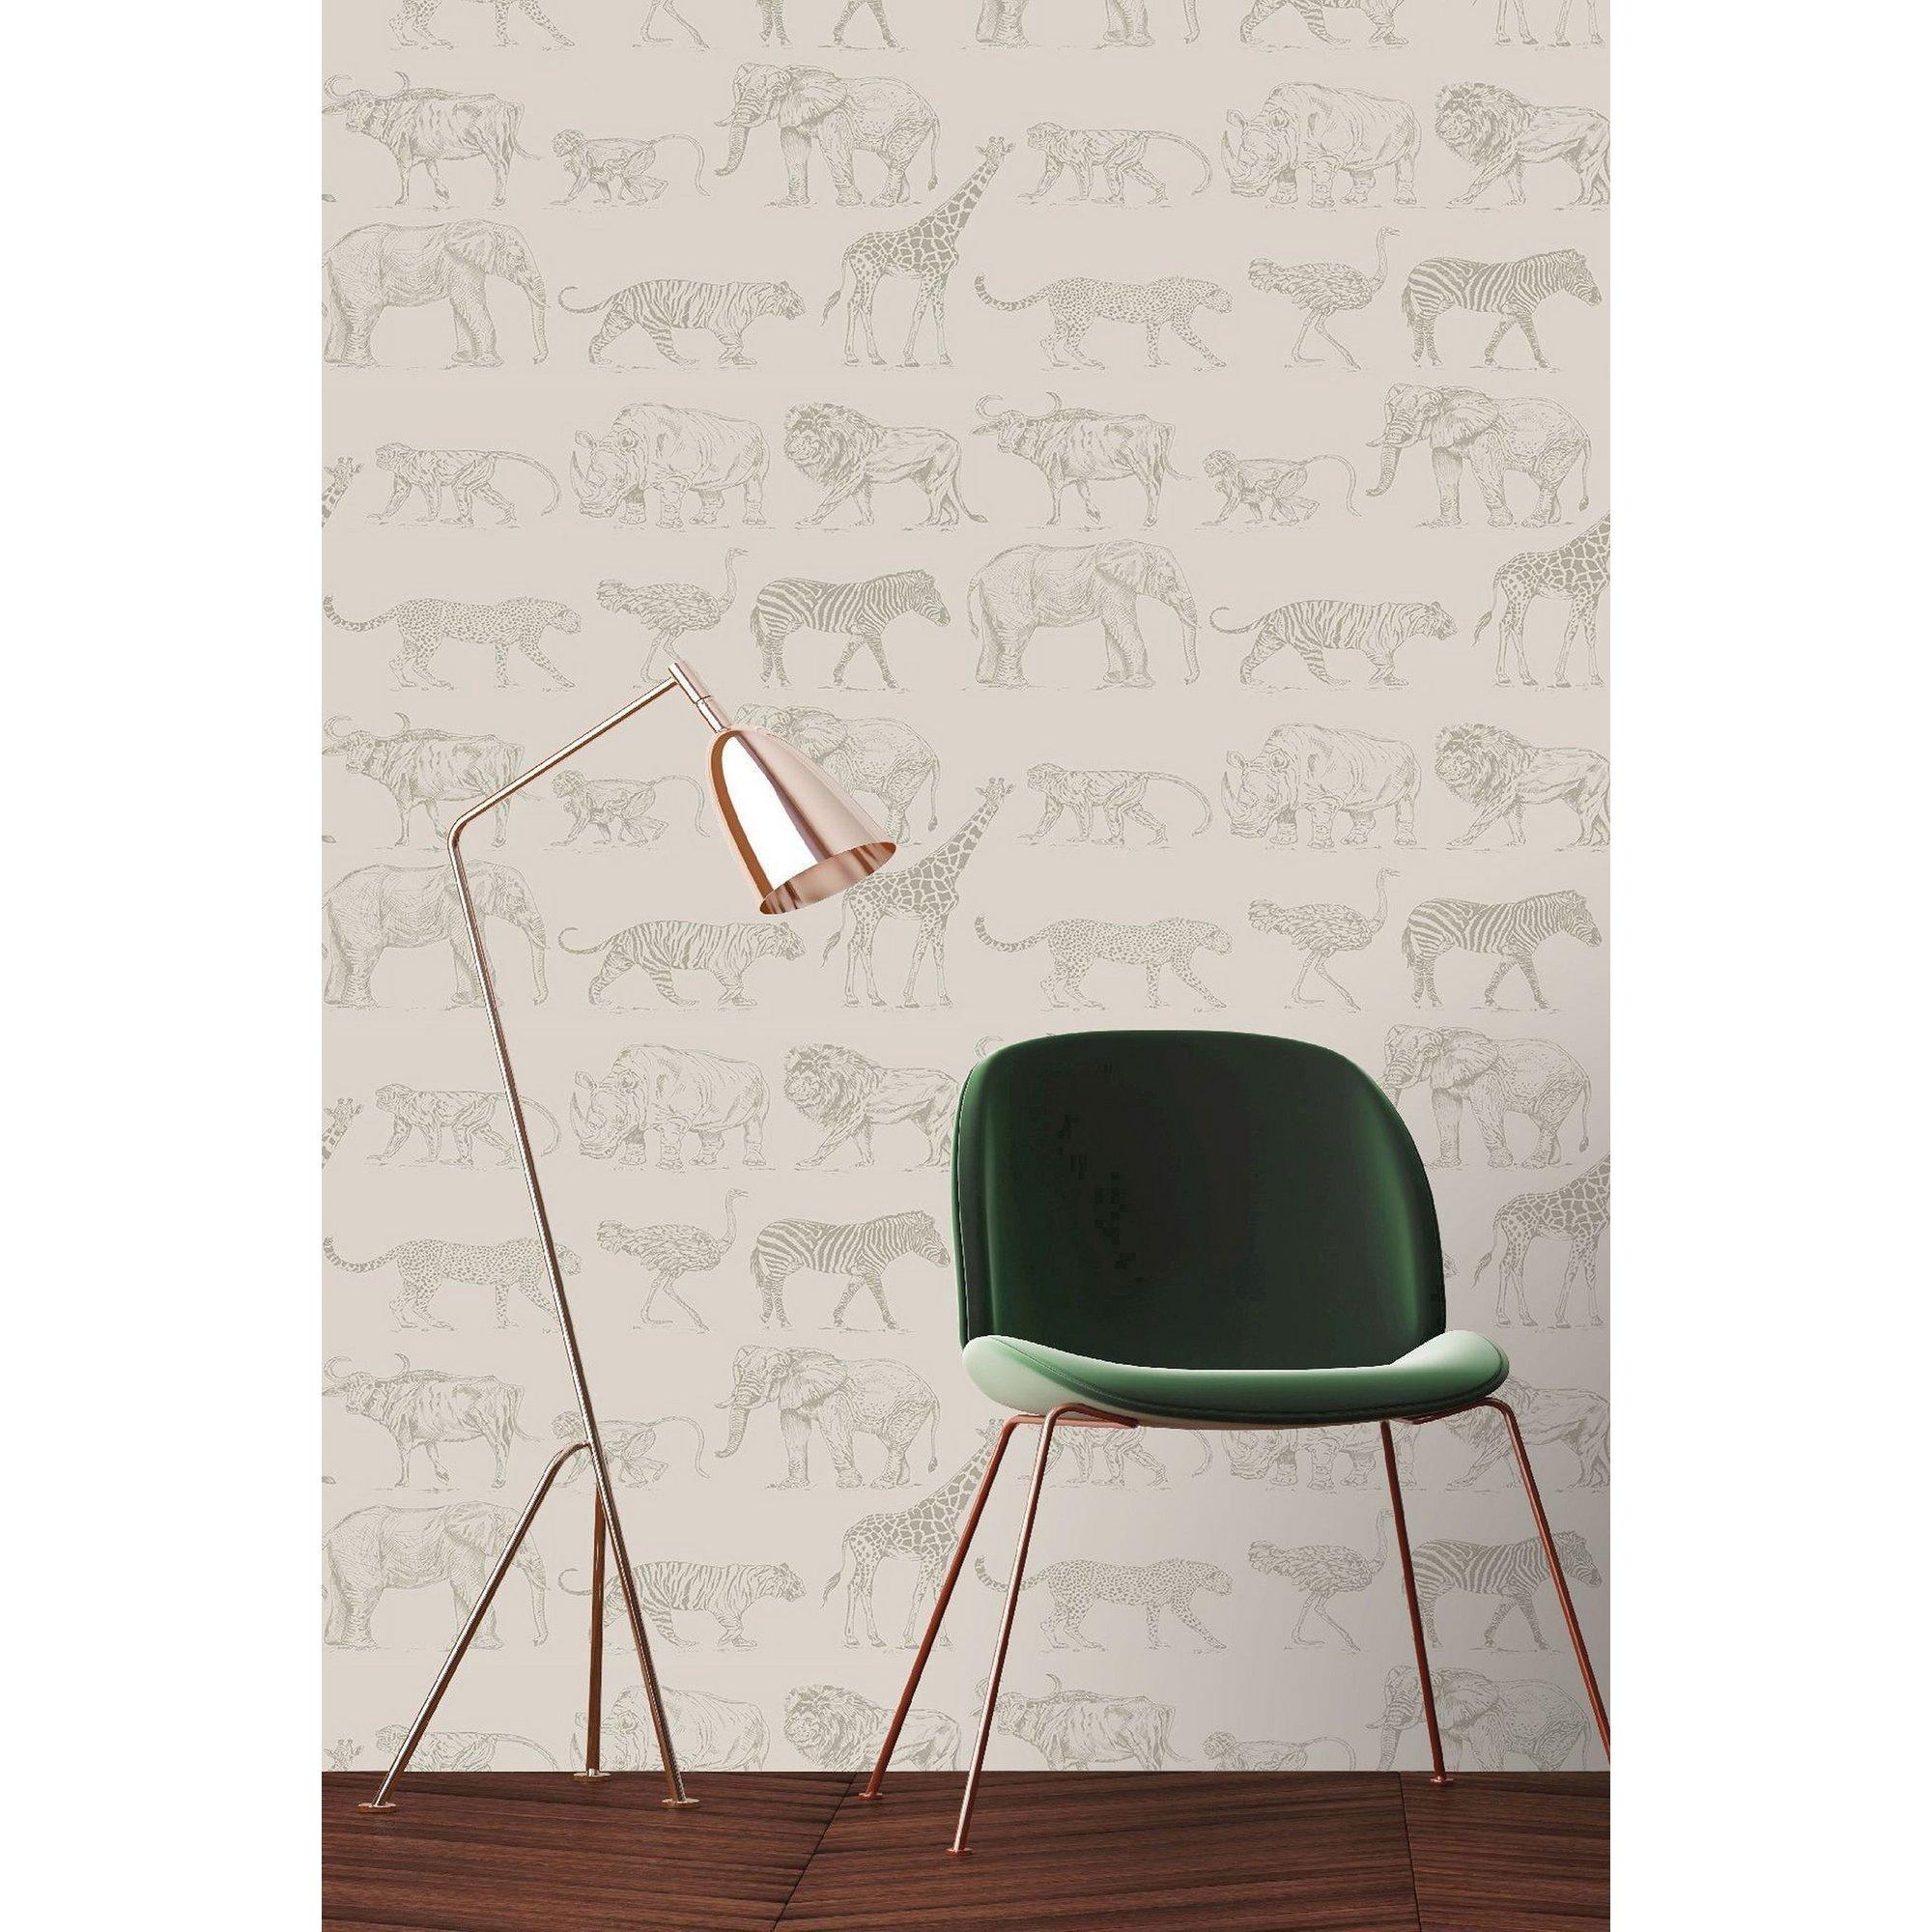 Image of Boutique Cream Animal Safari Wallpaper